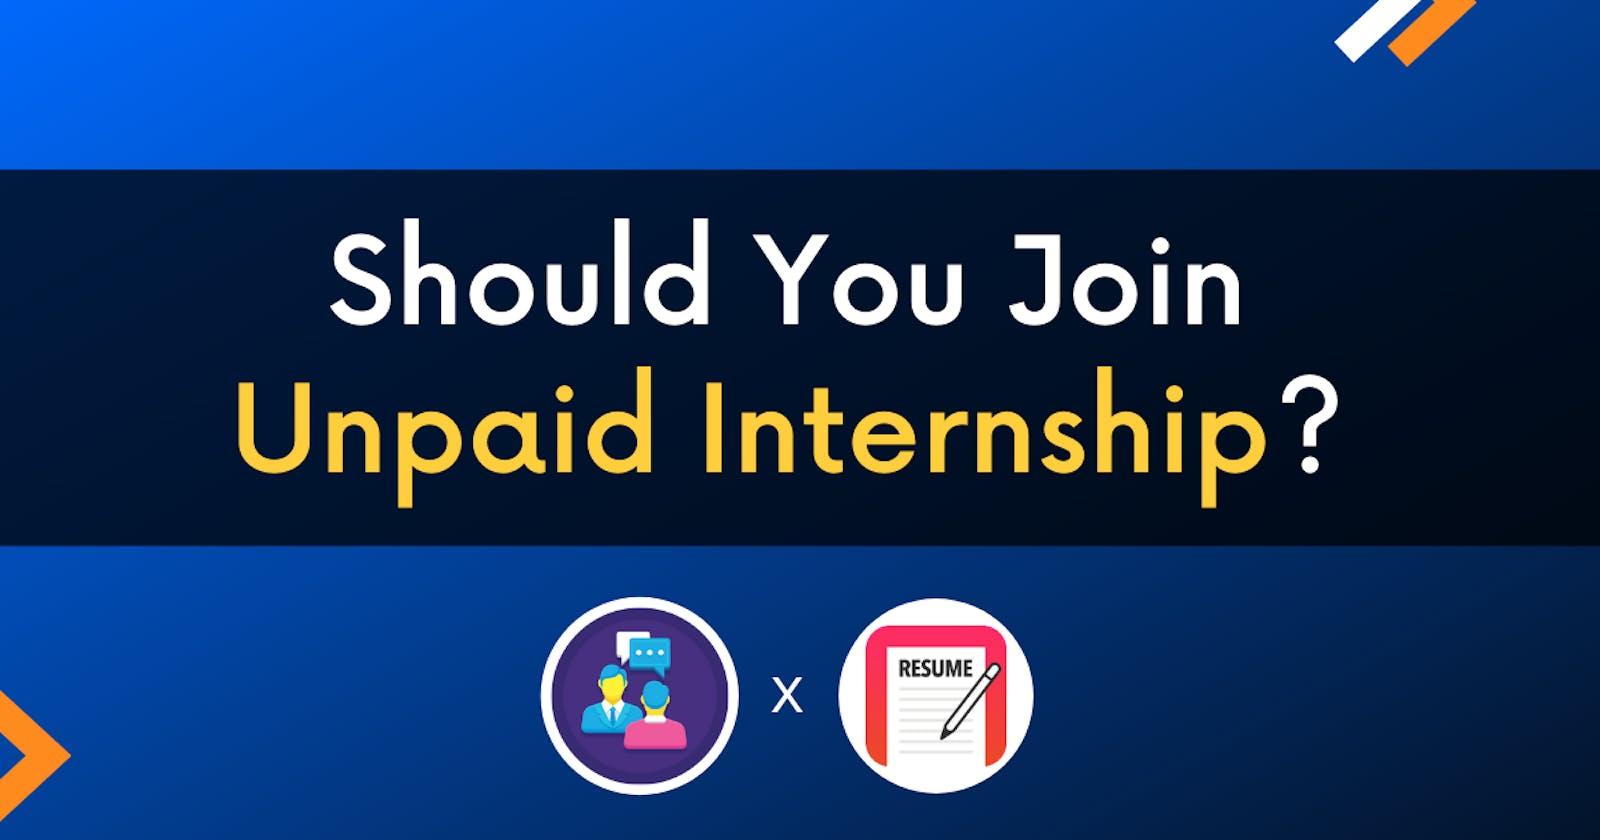 Should You Join Unpaid Internship?